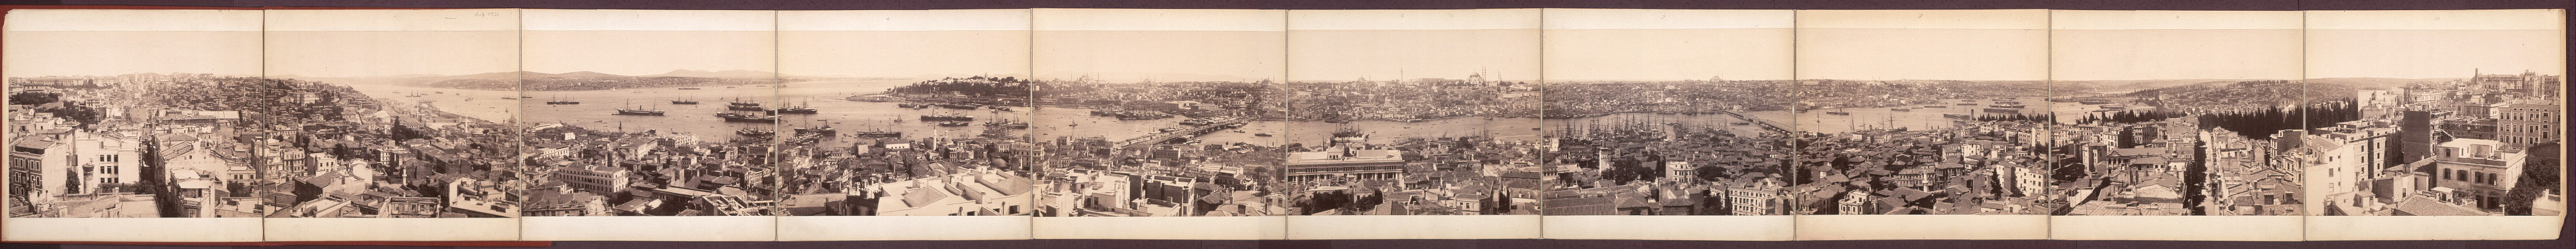 http://upload.wikimedia.org/wikipedia/commons/e/ea/Galata_Kulesi_%27nden_panorama.jpg